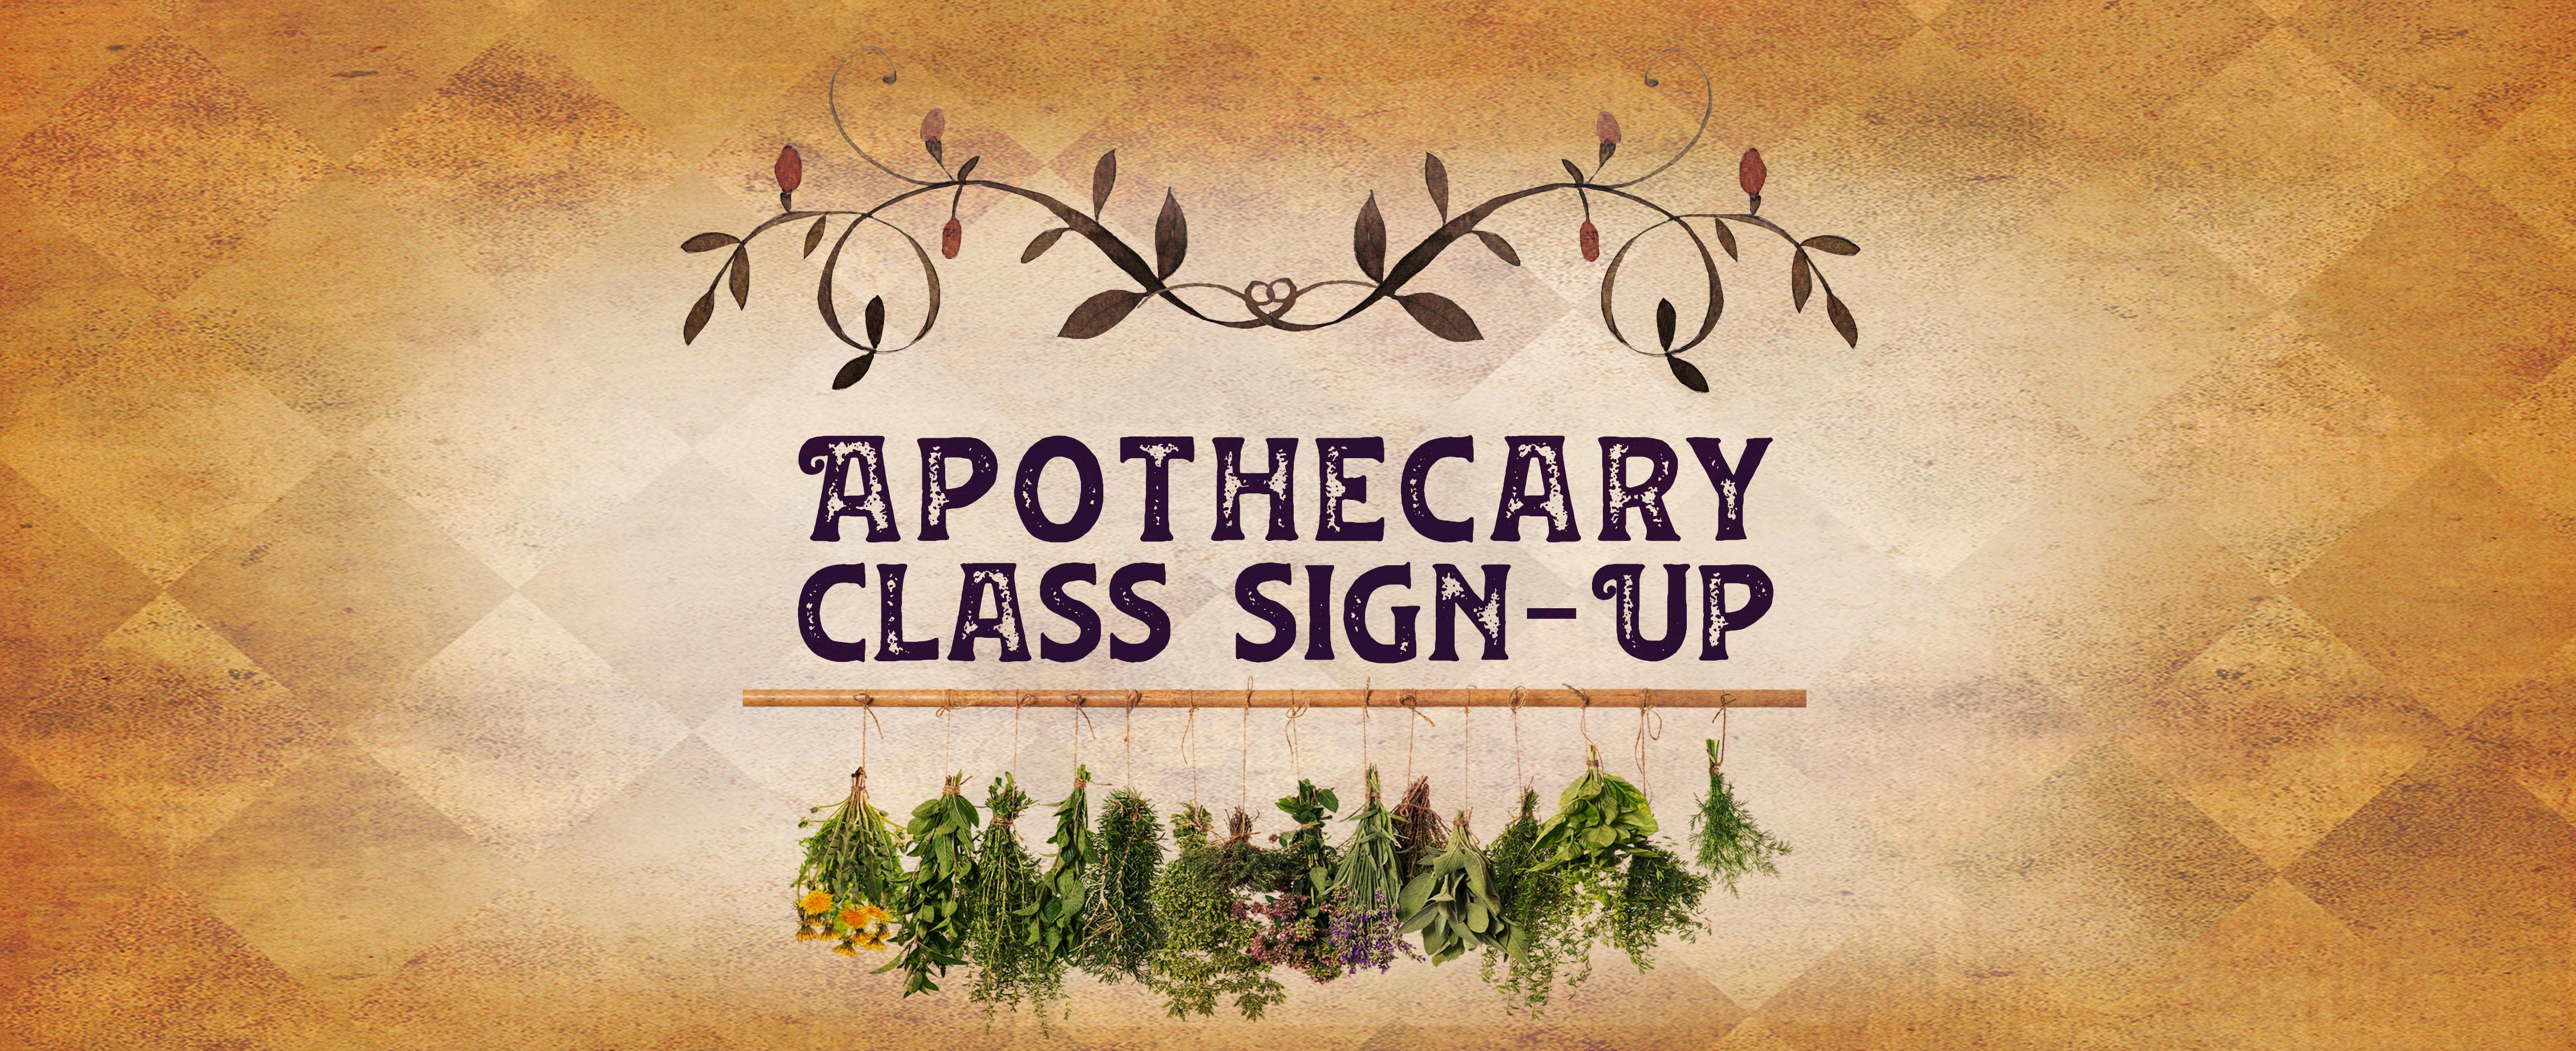 Apothecary Class Sign Up